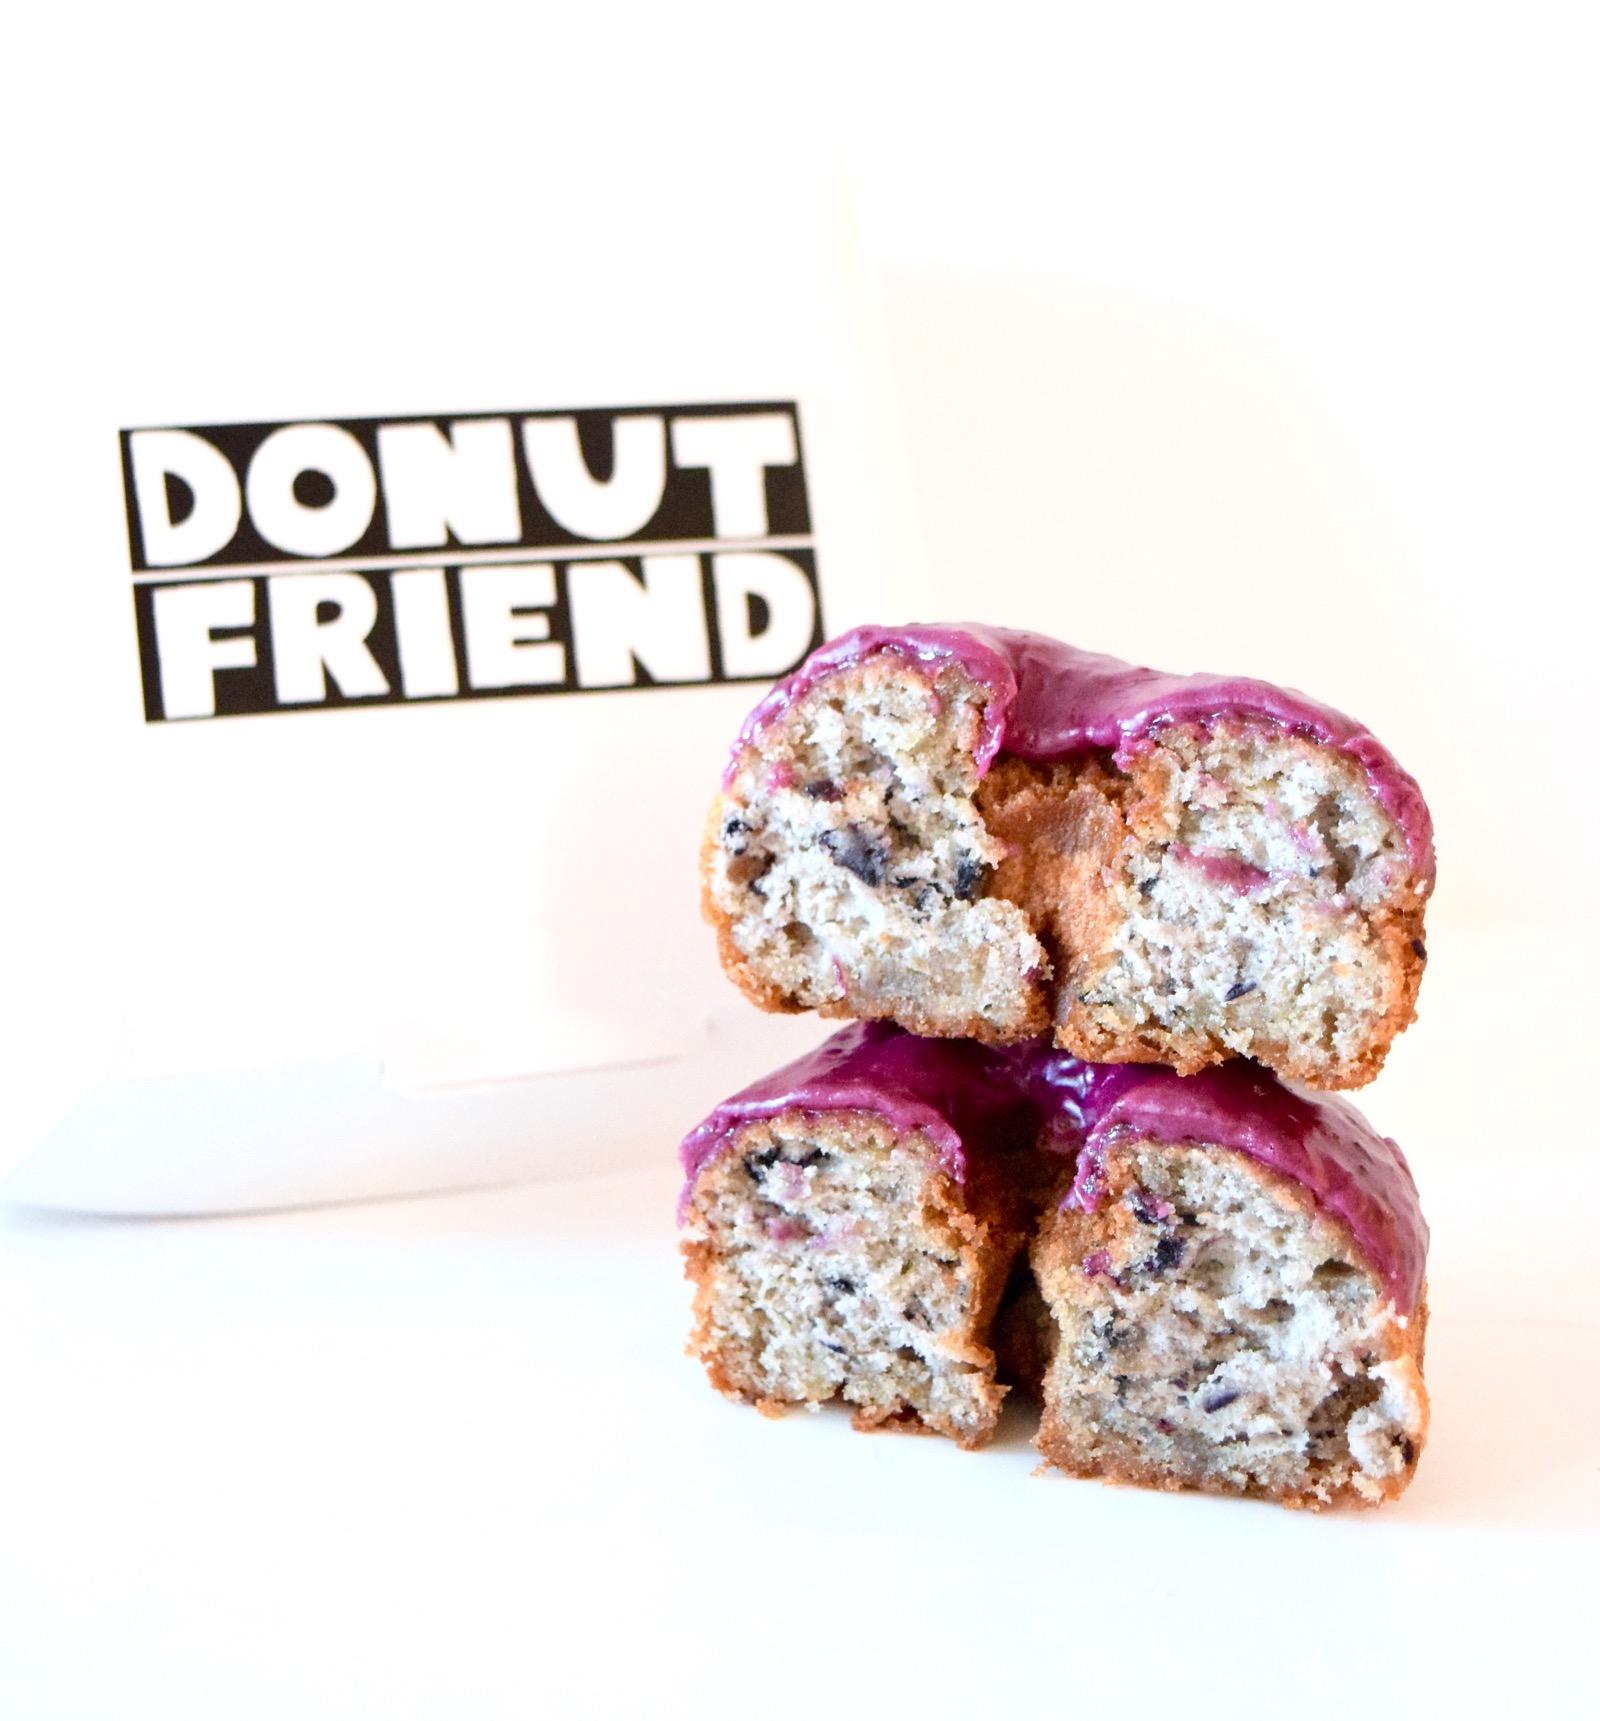 Donut Friend Los Angeles